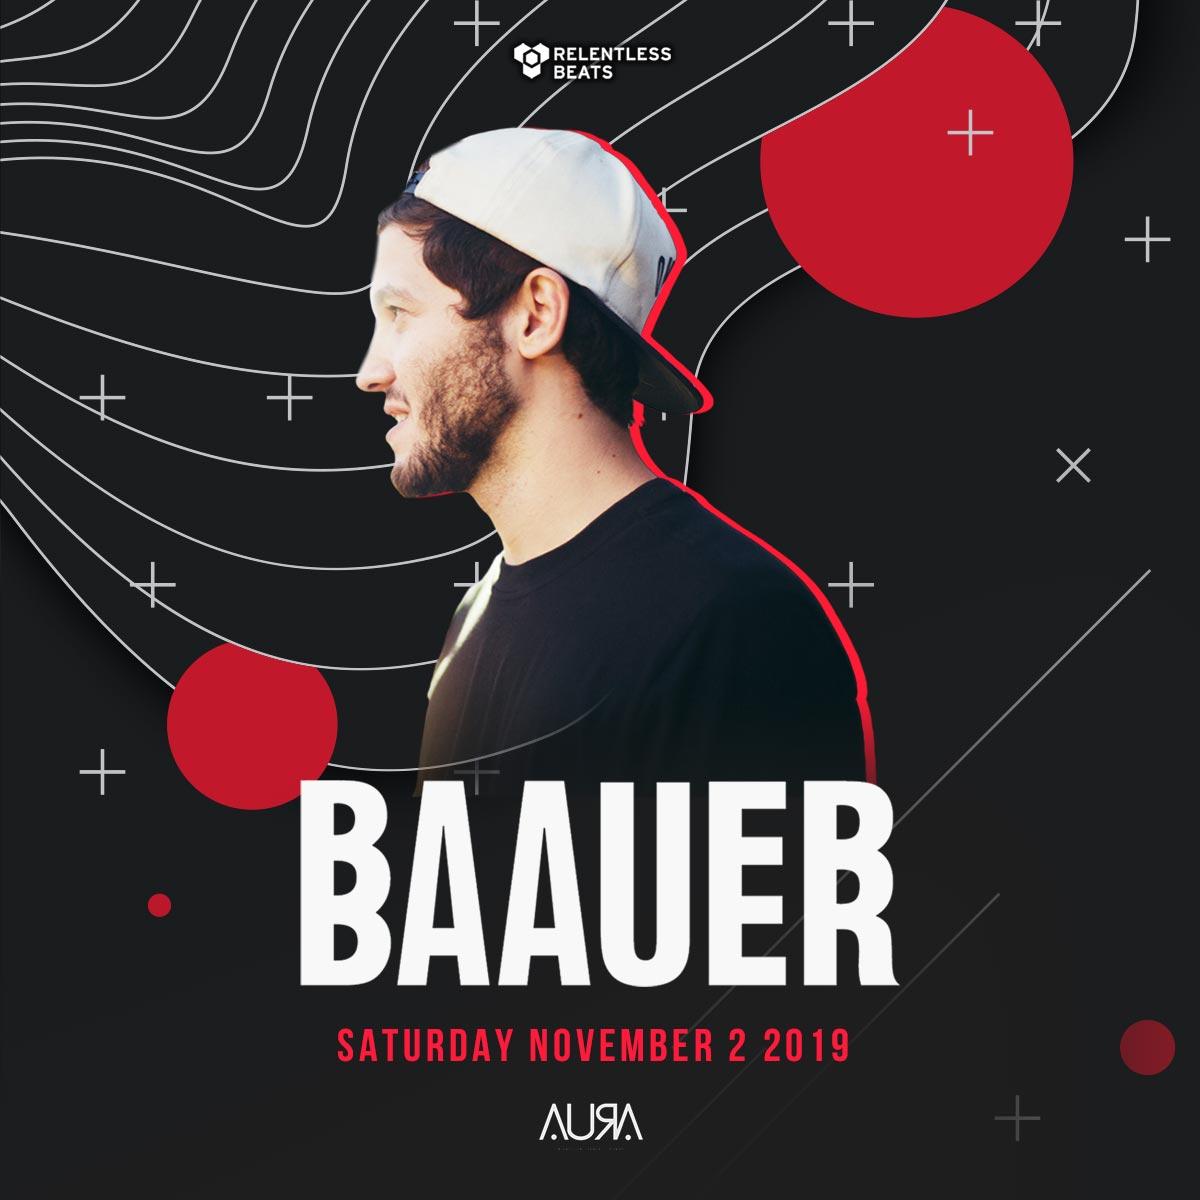 Flyer for Baauer